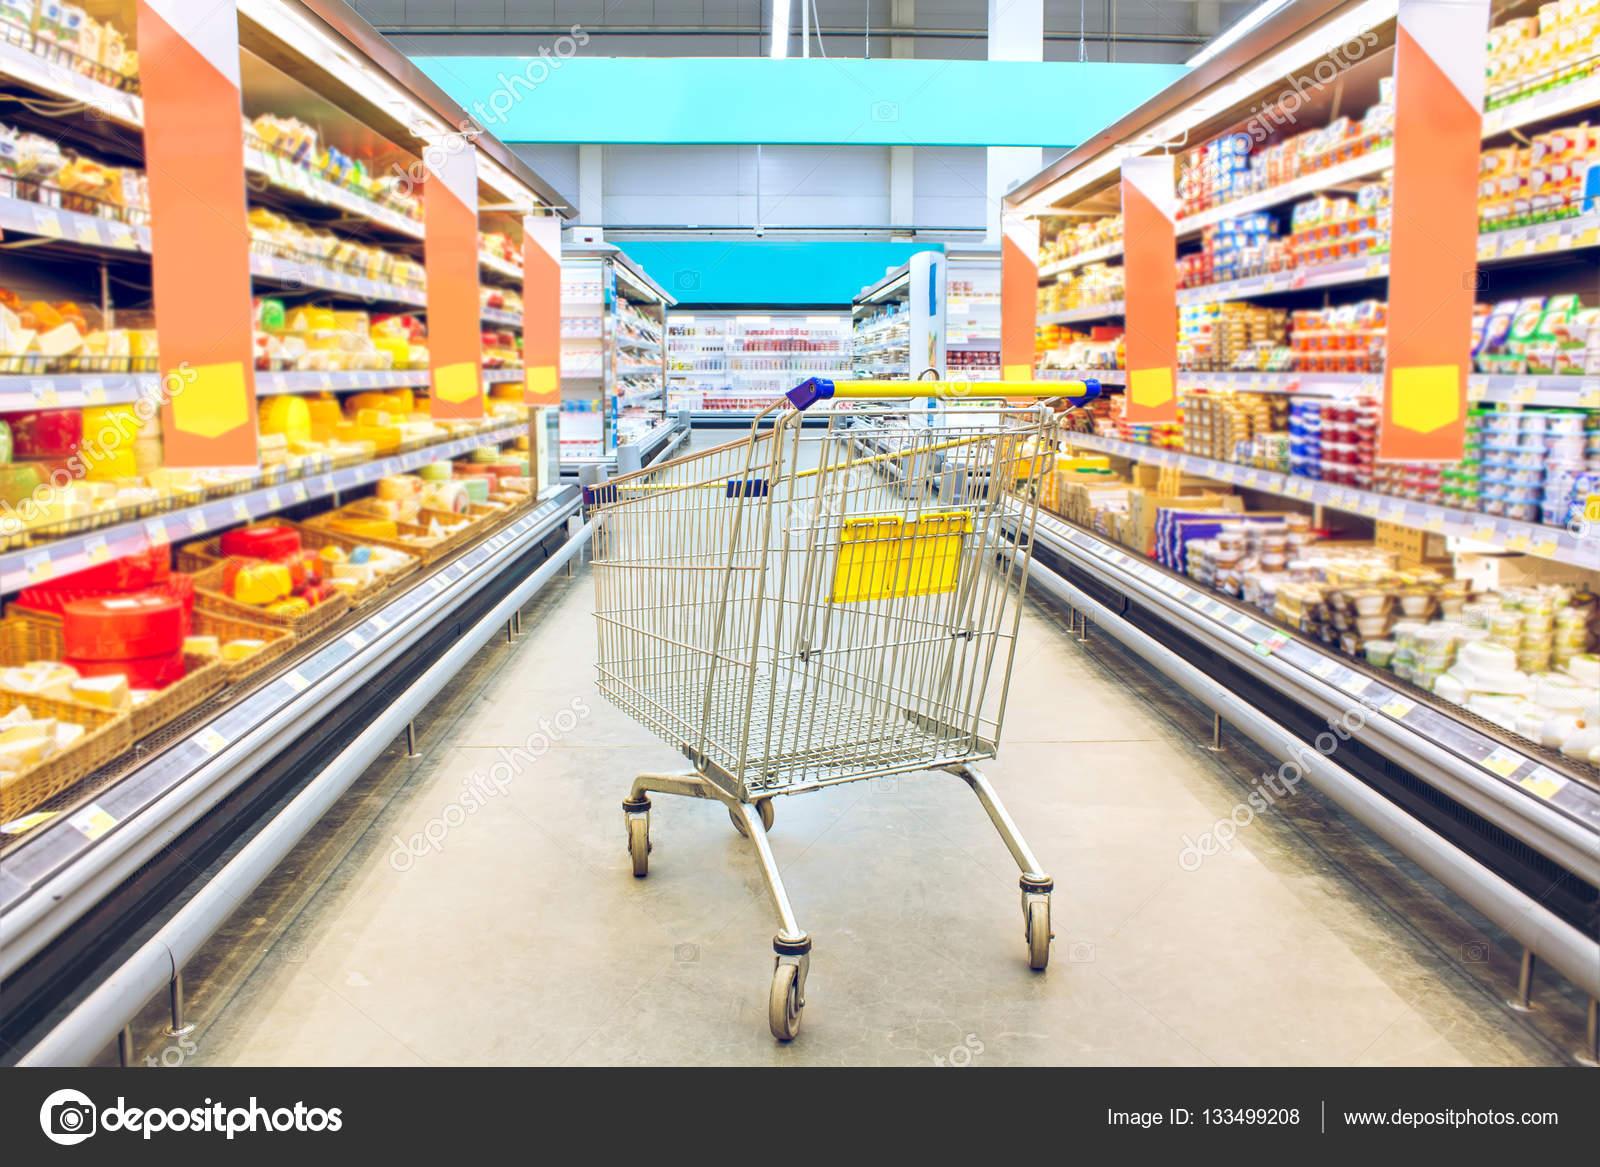 Бизнес идеи для супермаркетов идеи для бизнеса сочи